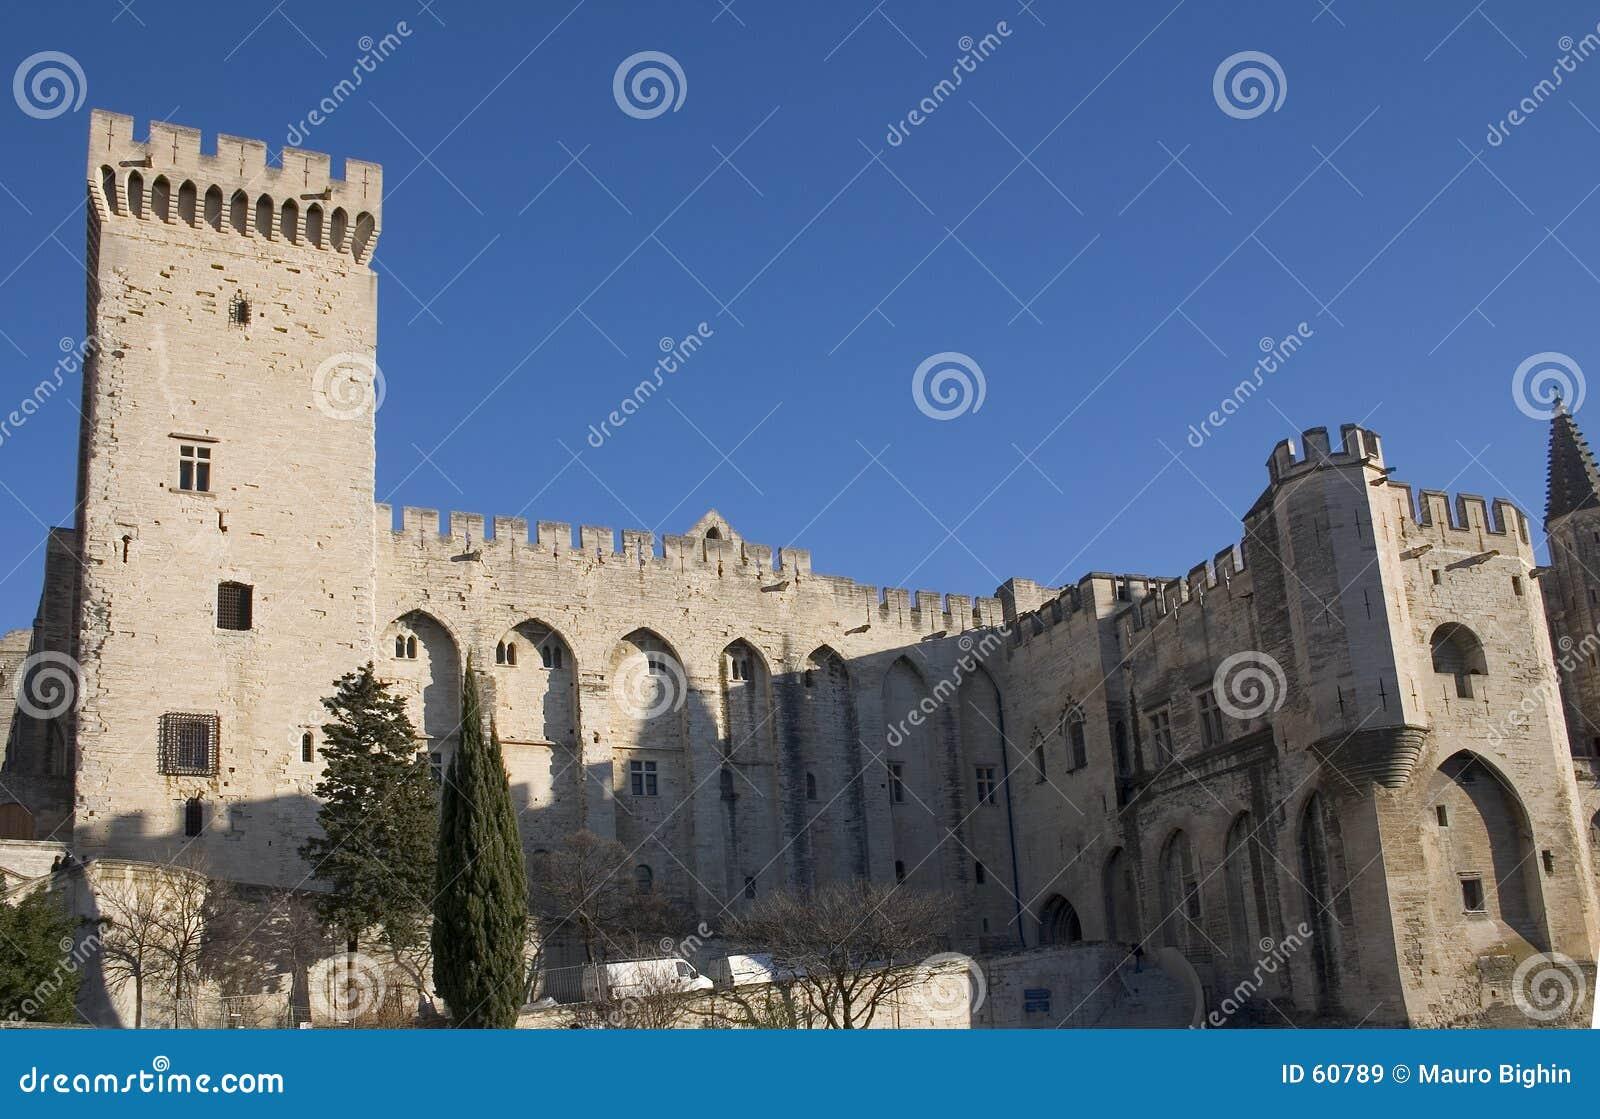 Palace - Avignon - Francia dei papi